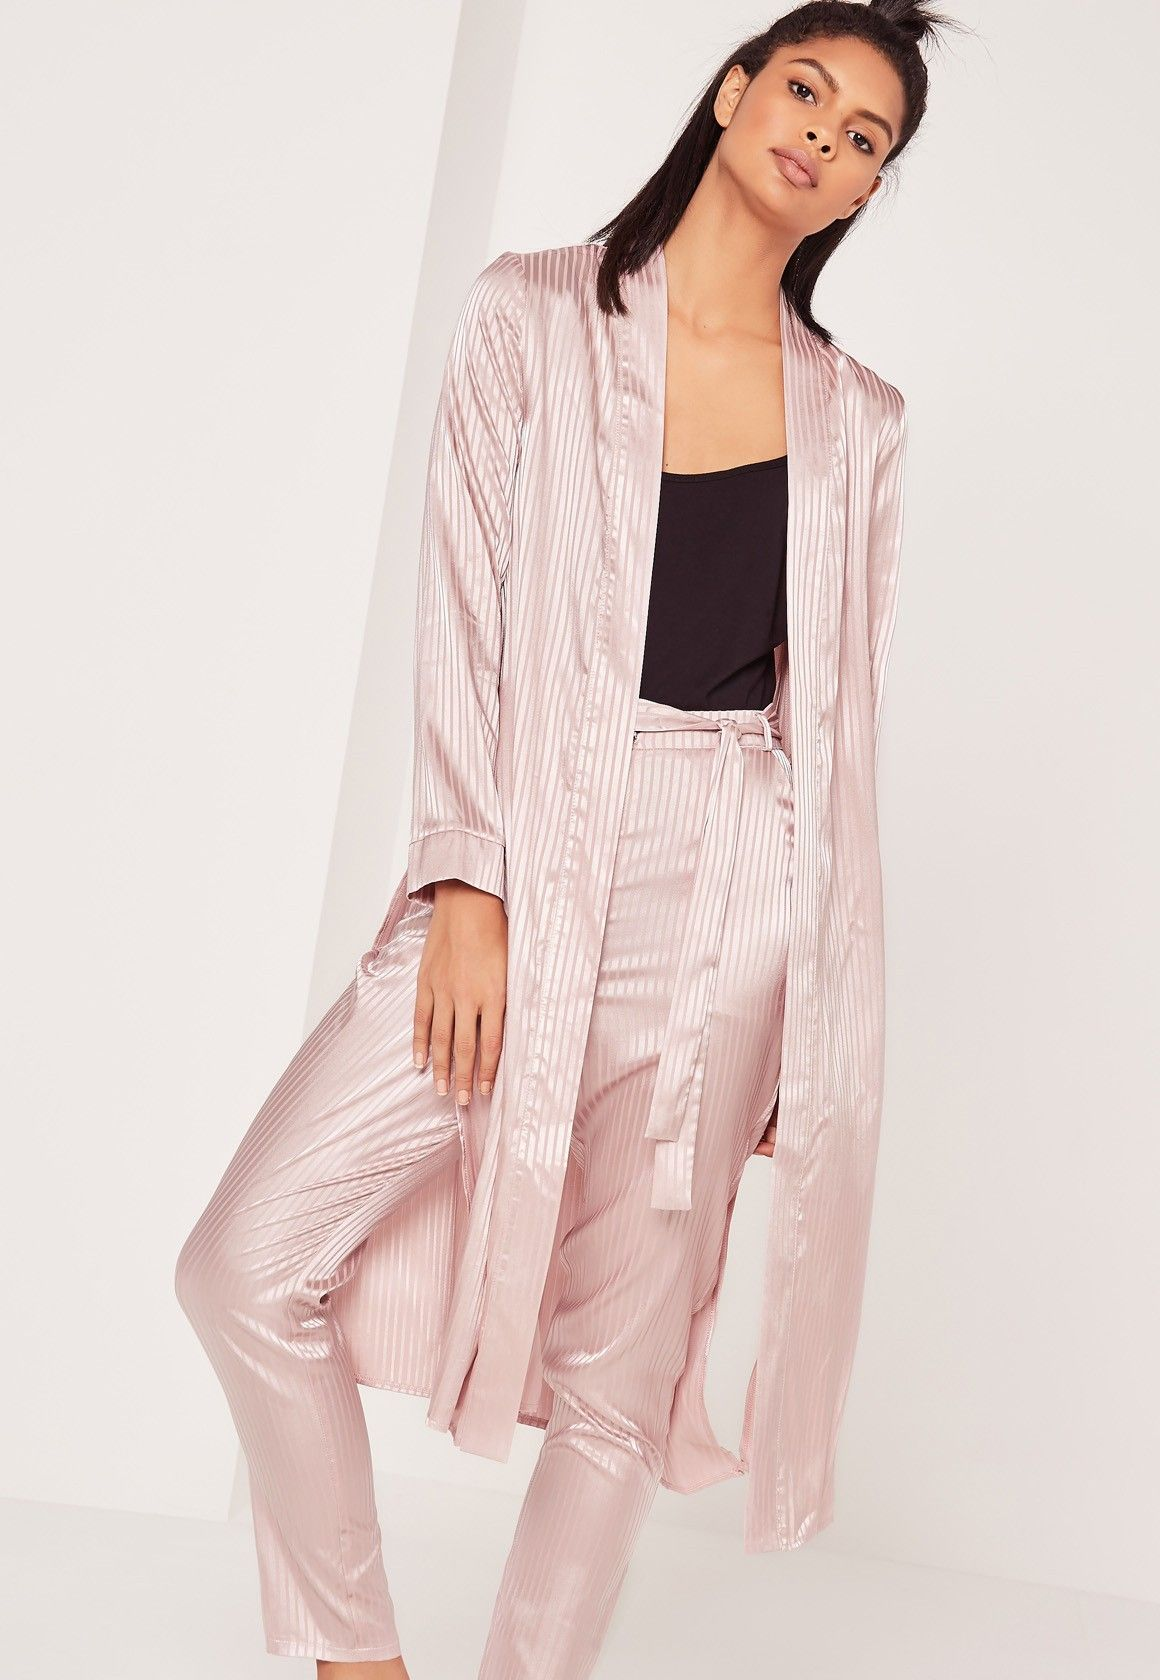 Missguided - Premium Silk Stripe Duster Jacket Pink | My Polyvore ...